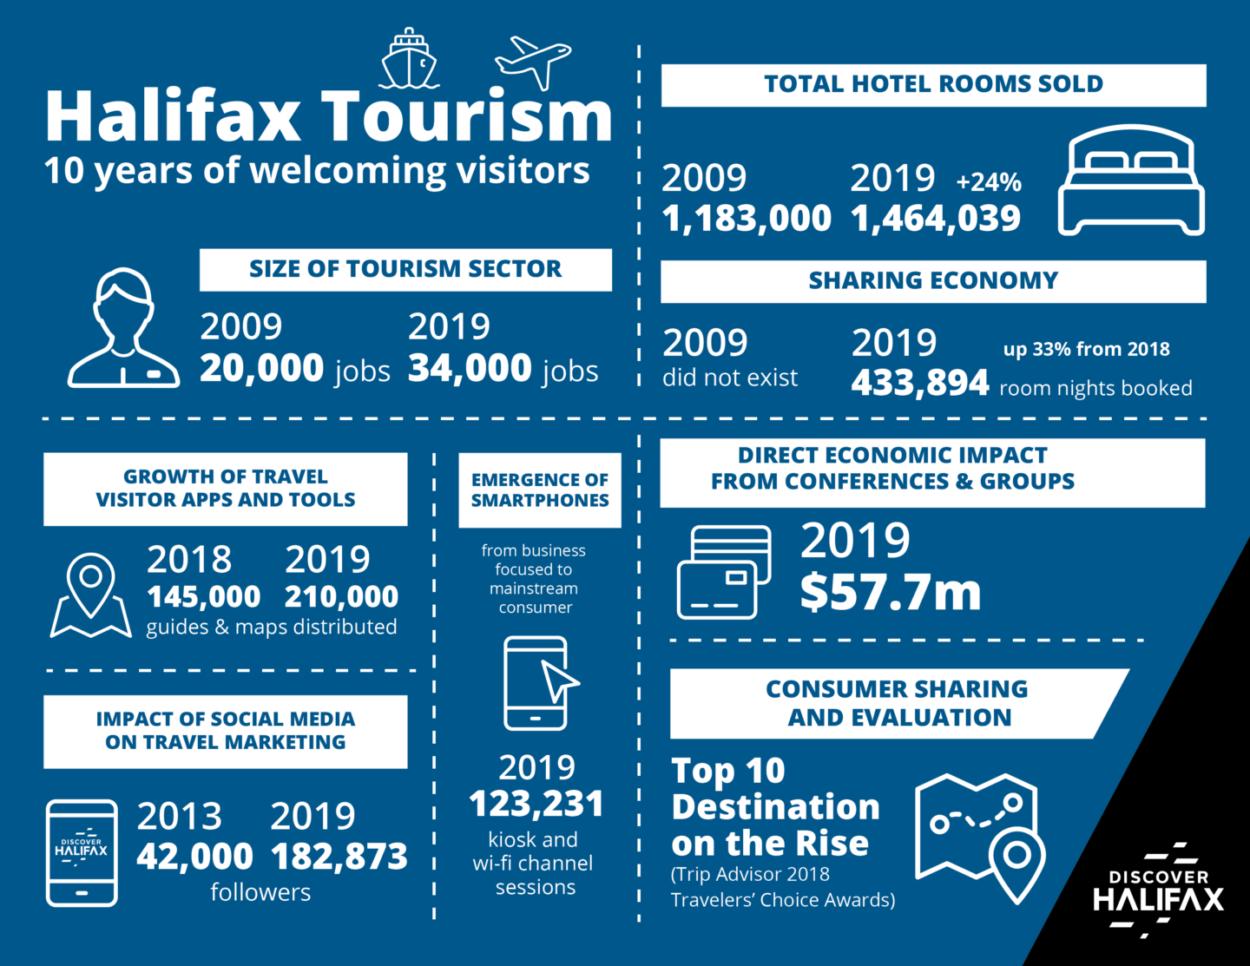 10 Year Tourism Infographic 300dpi